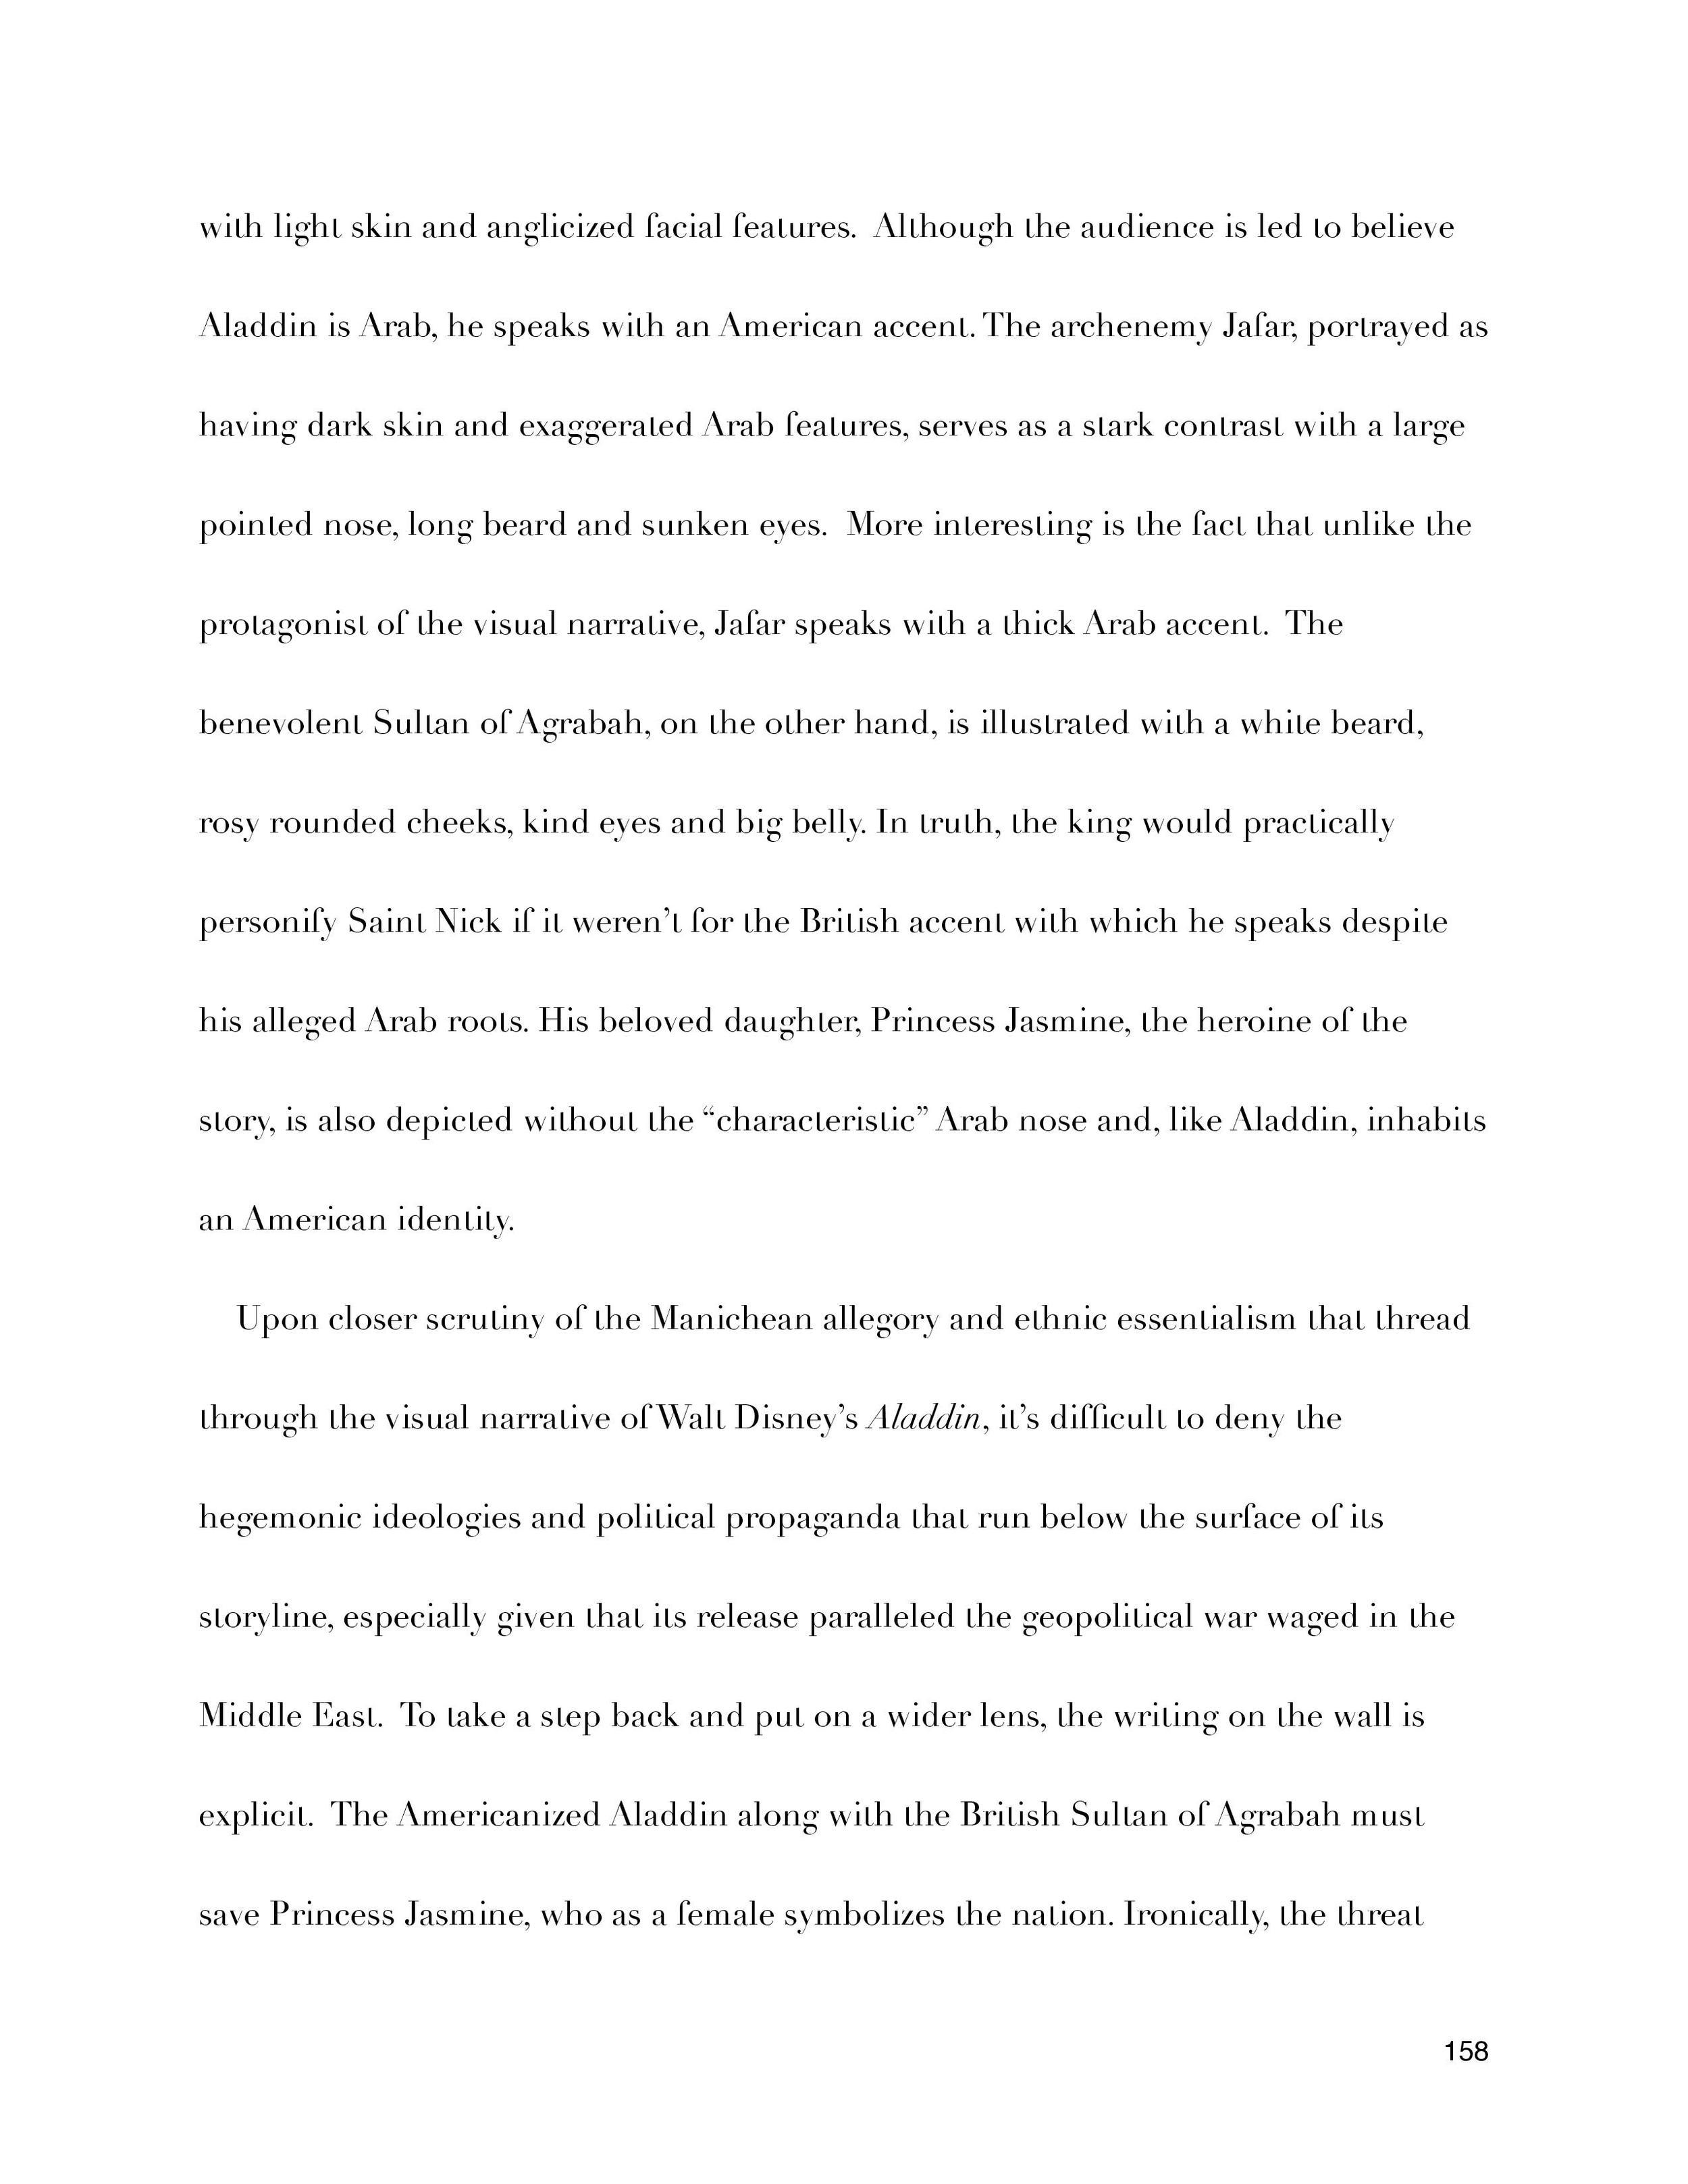 ShatteredGlass-page-159.jpg